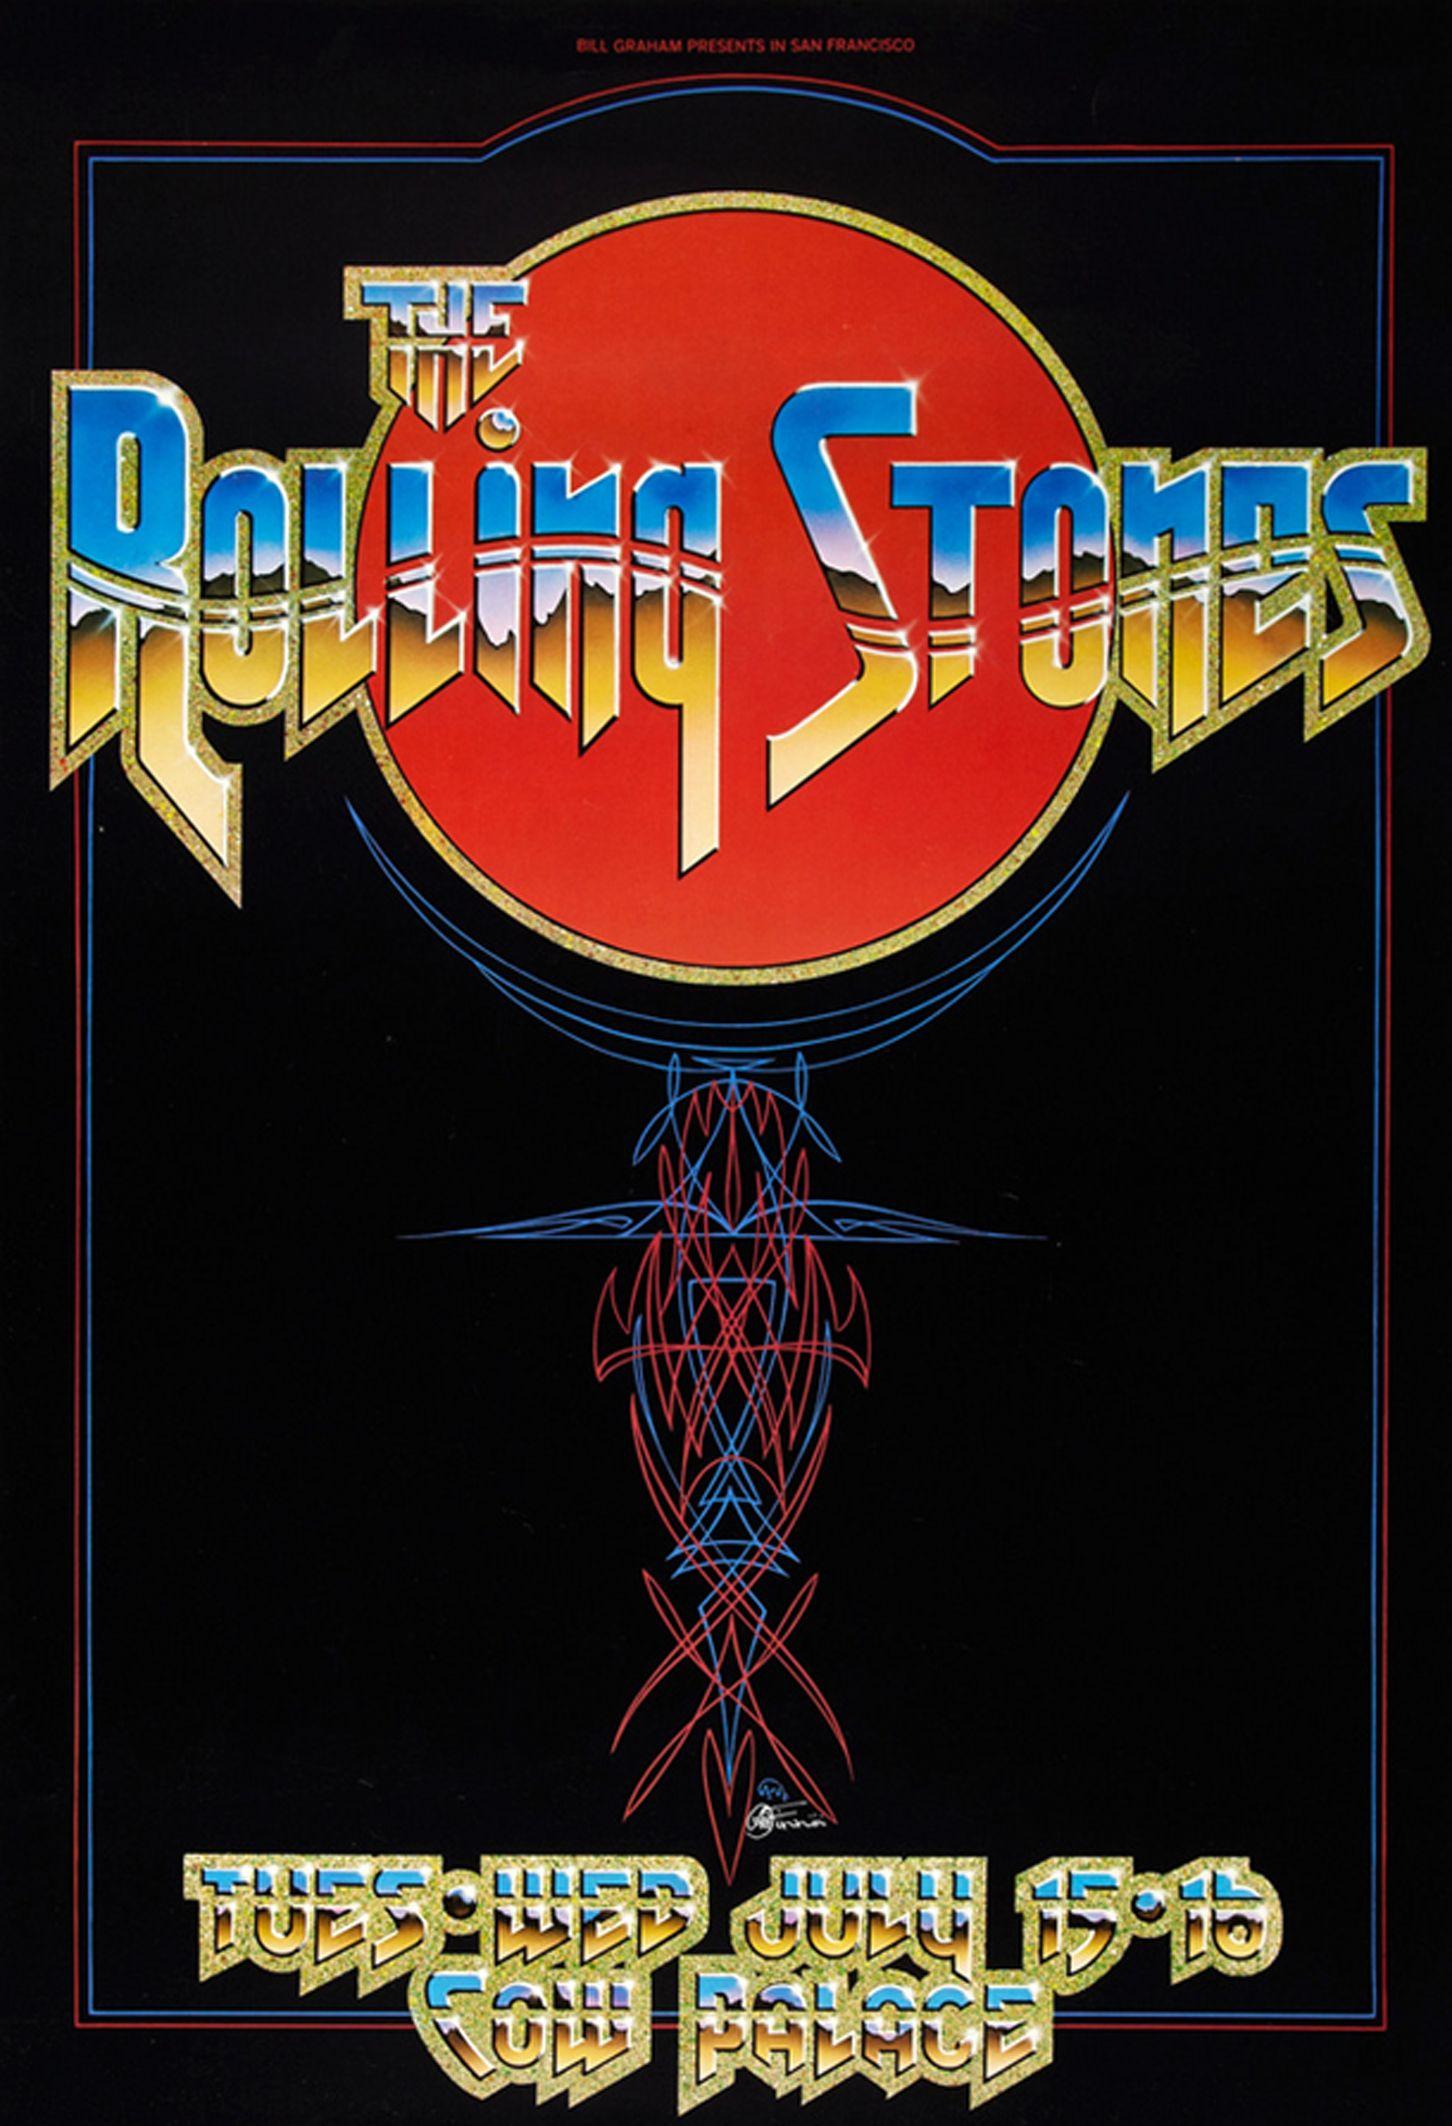 The Rolling Stones 1975 Concert Posters Vintage Concert